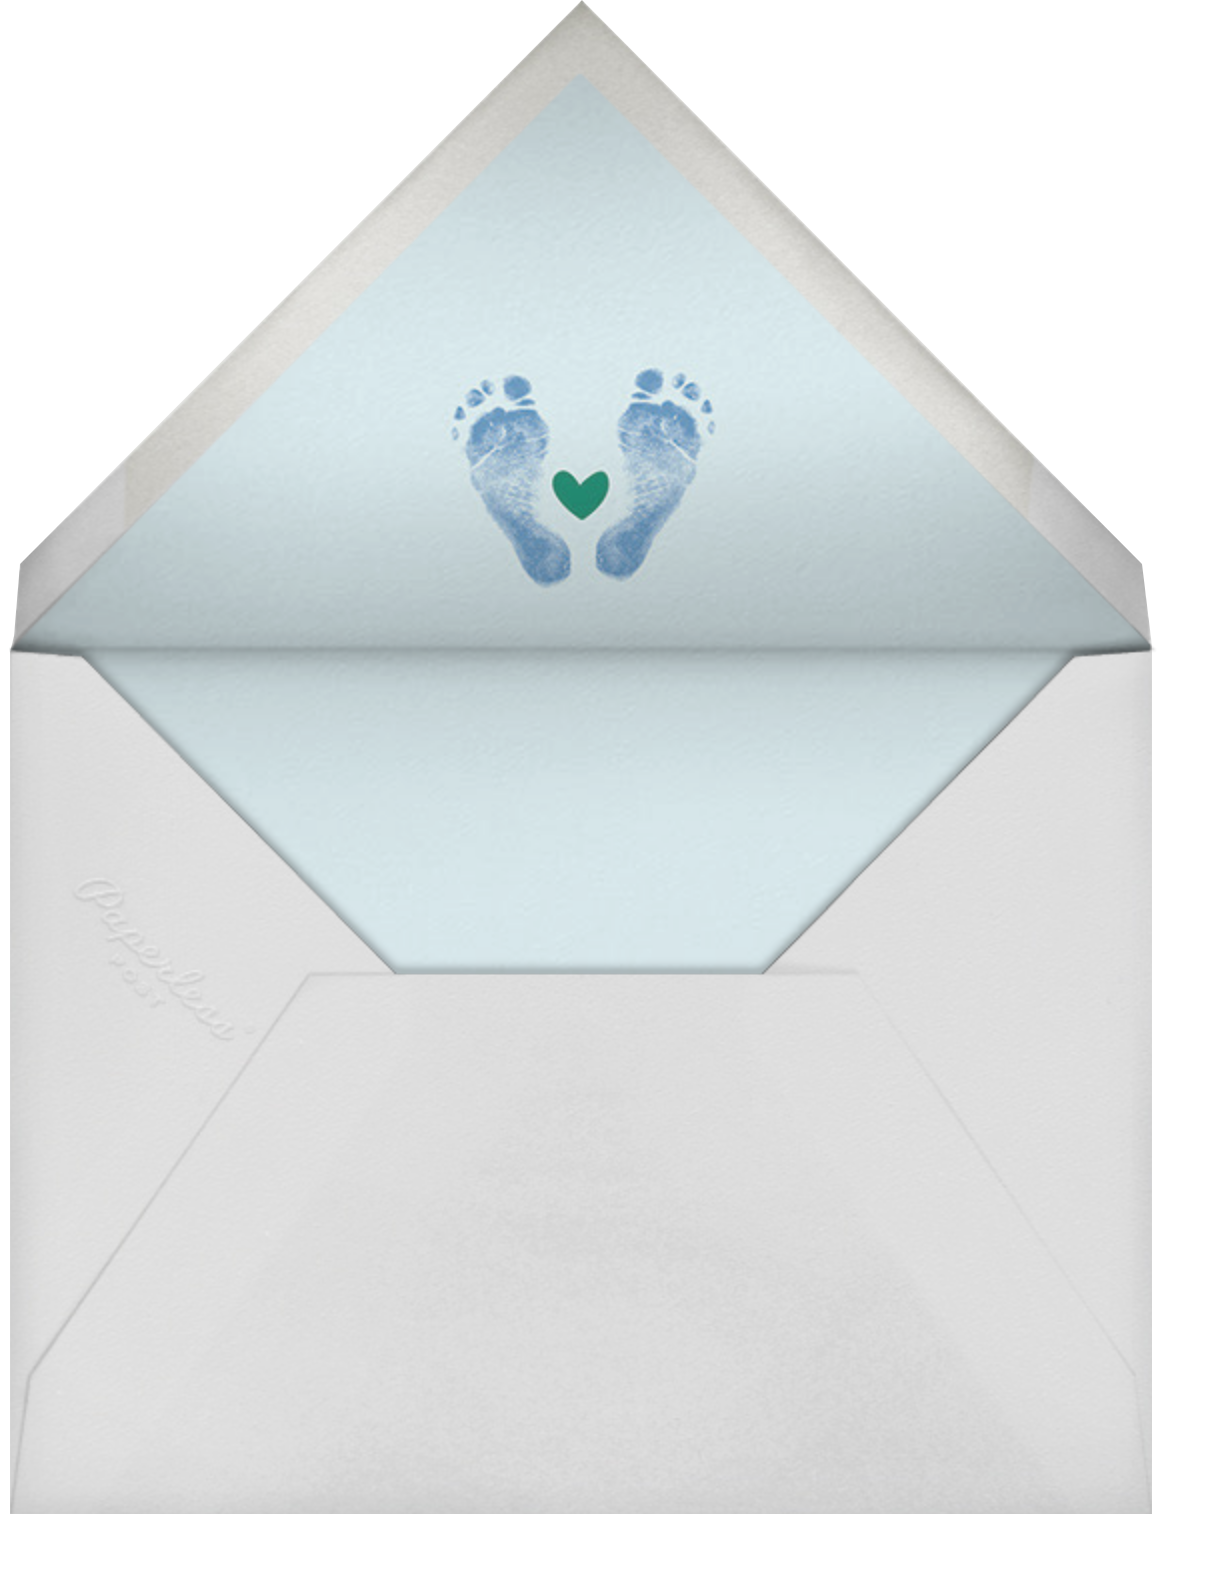 Head to Toe - Blue - Cheree Berry Paper & Design - Birth - envelope back